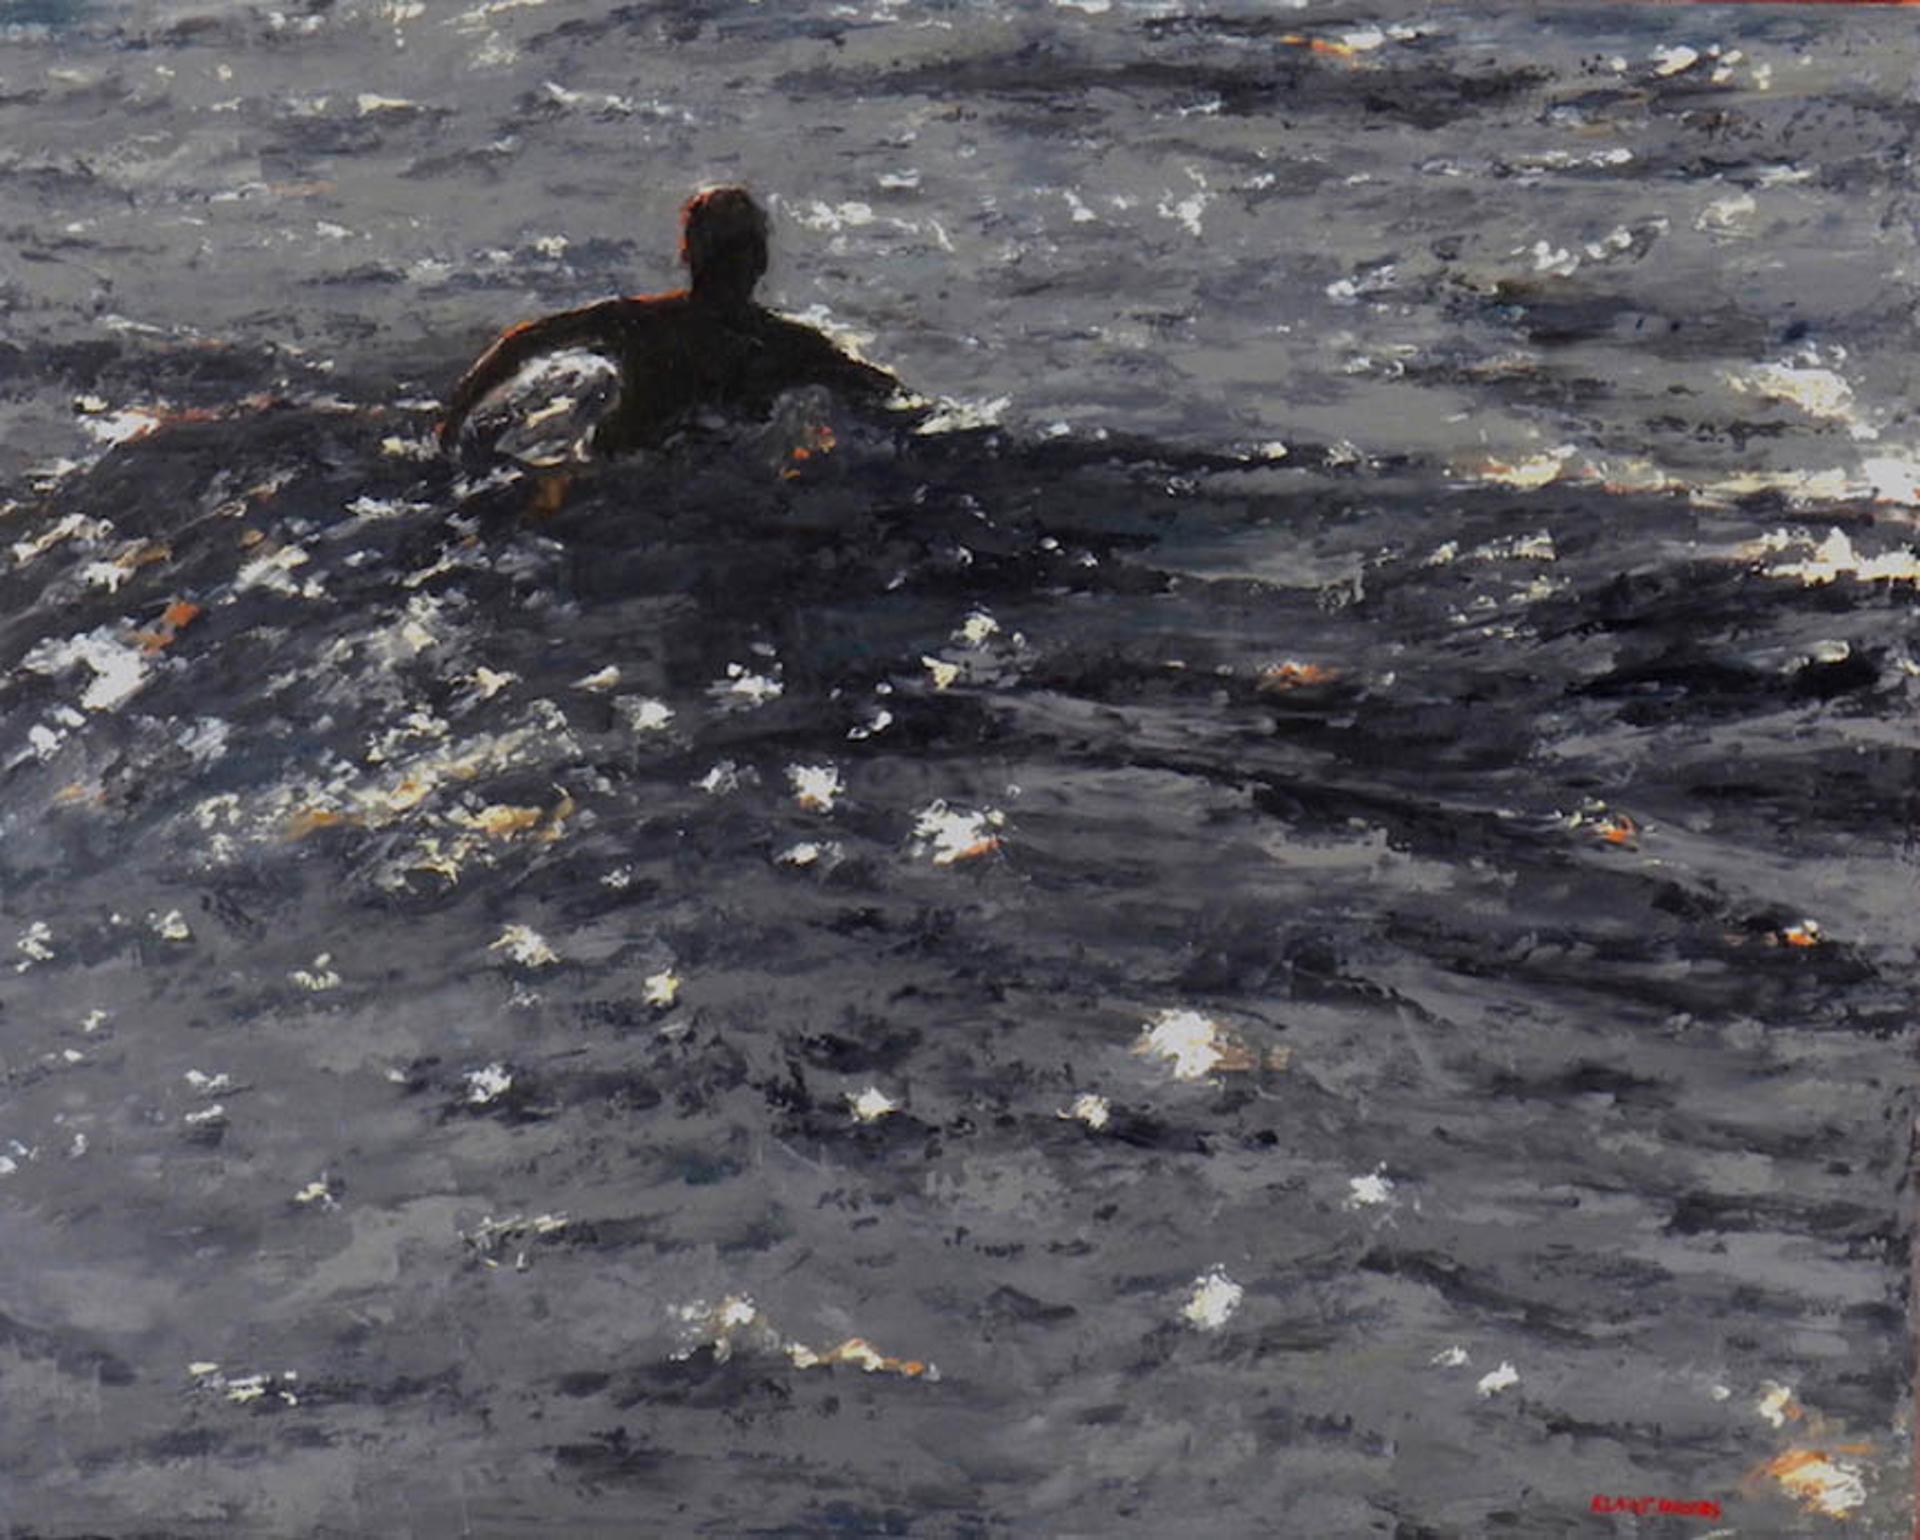 Twilight Surfing by Elaine Hughes